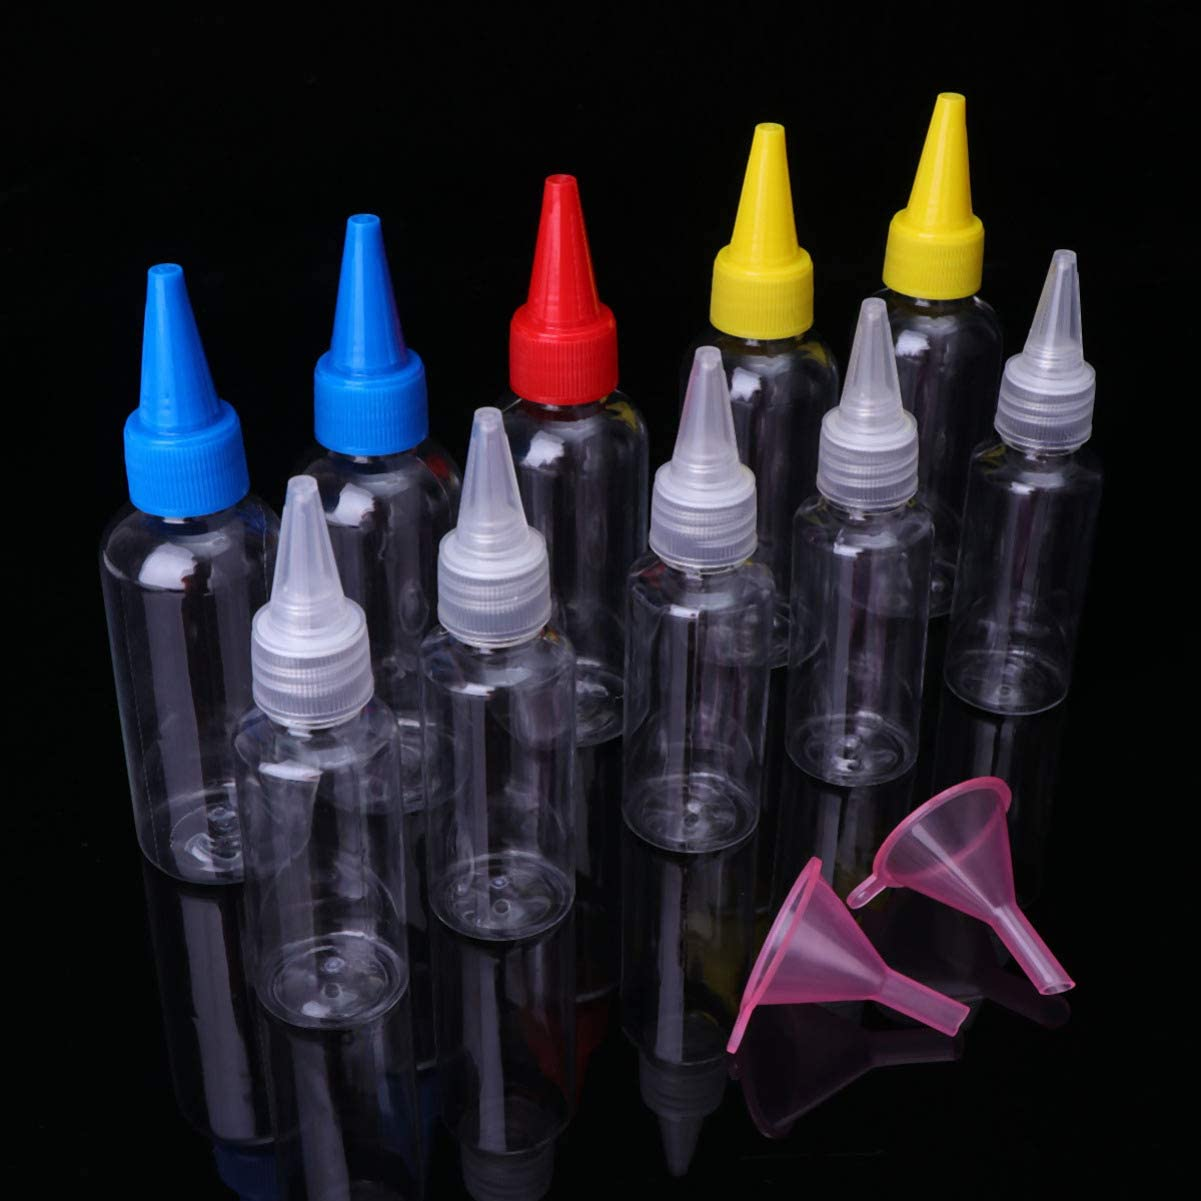 Random Color UPKOCH 20pcs Small Plastic Squeeze Bottles for Sauce Condiments Dressing Paint Olive Oil BBQ with Twist On Cap Lids 10pcs 30ml+10pcs 60ml